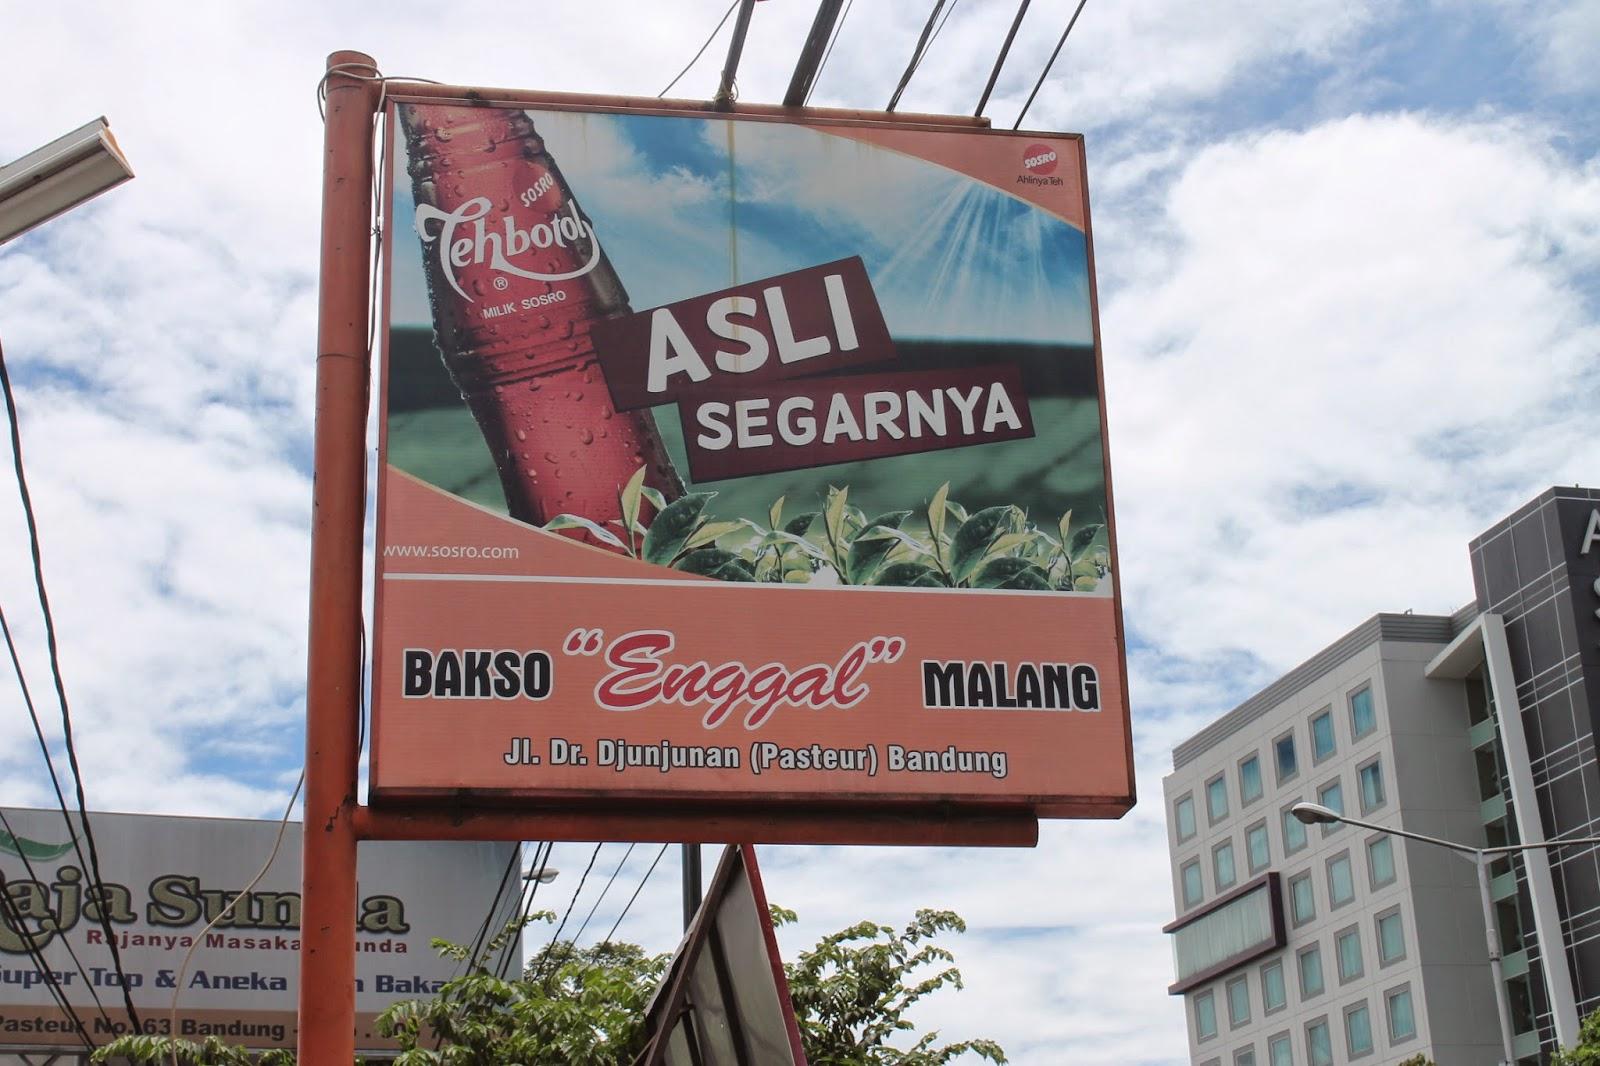 Autumn Leaf Foodspot 6 Bakso Enggal Malang